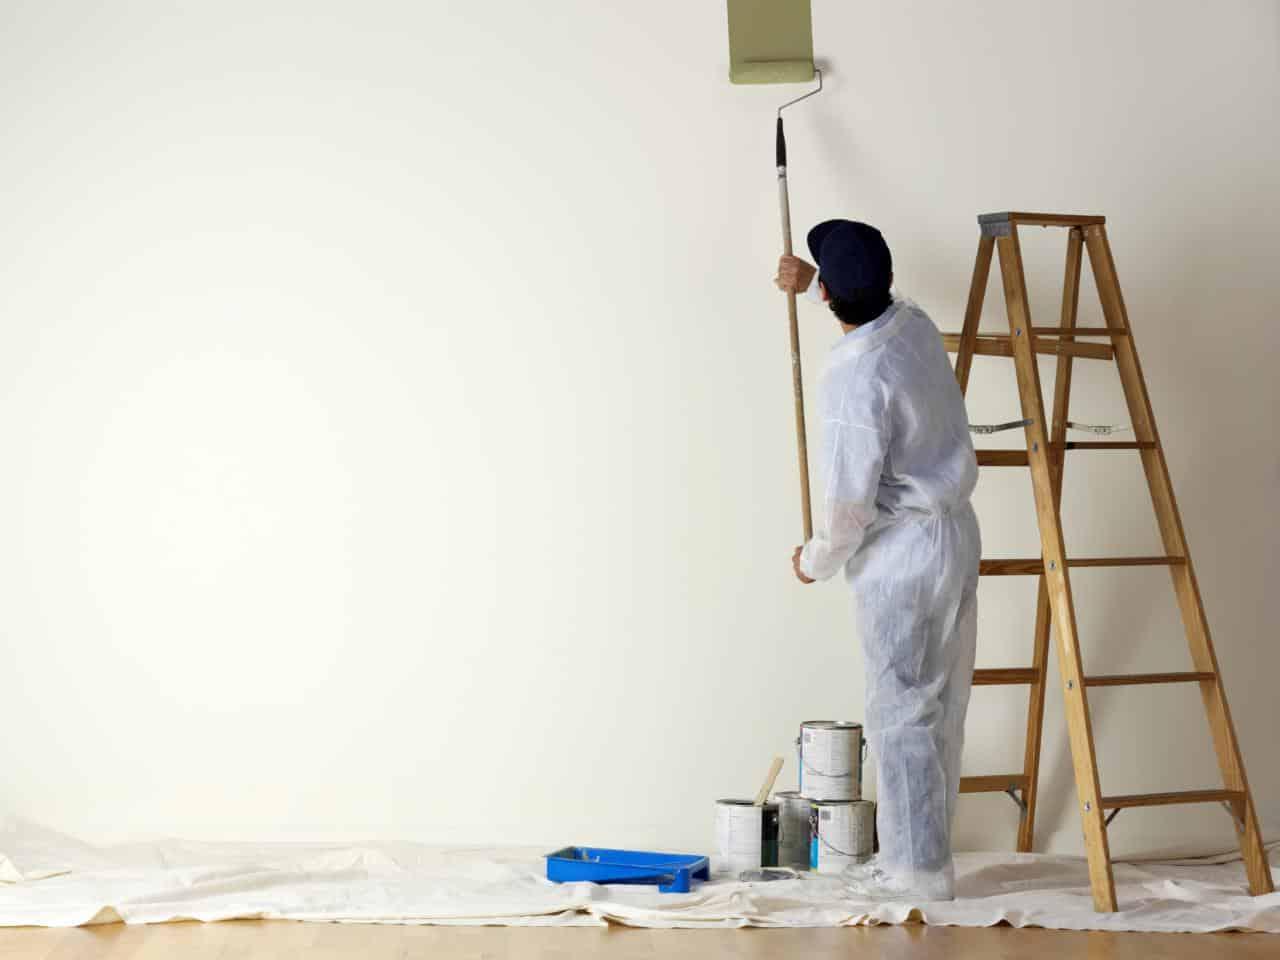 Parede de drywall com pintura